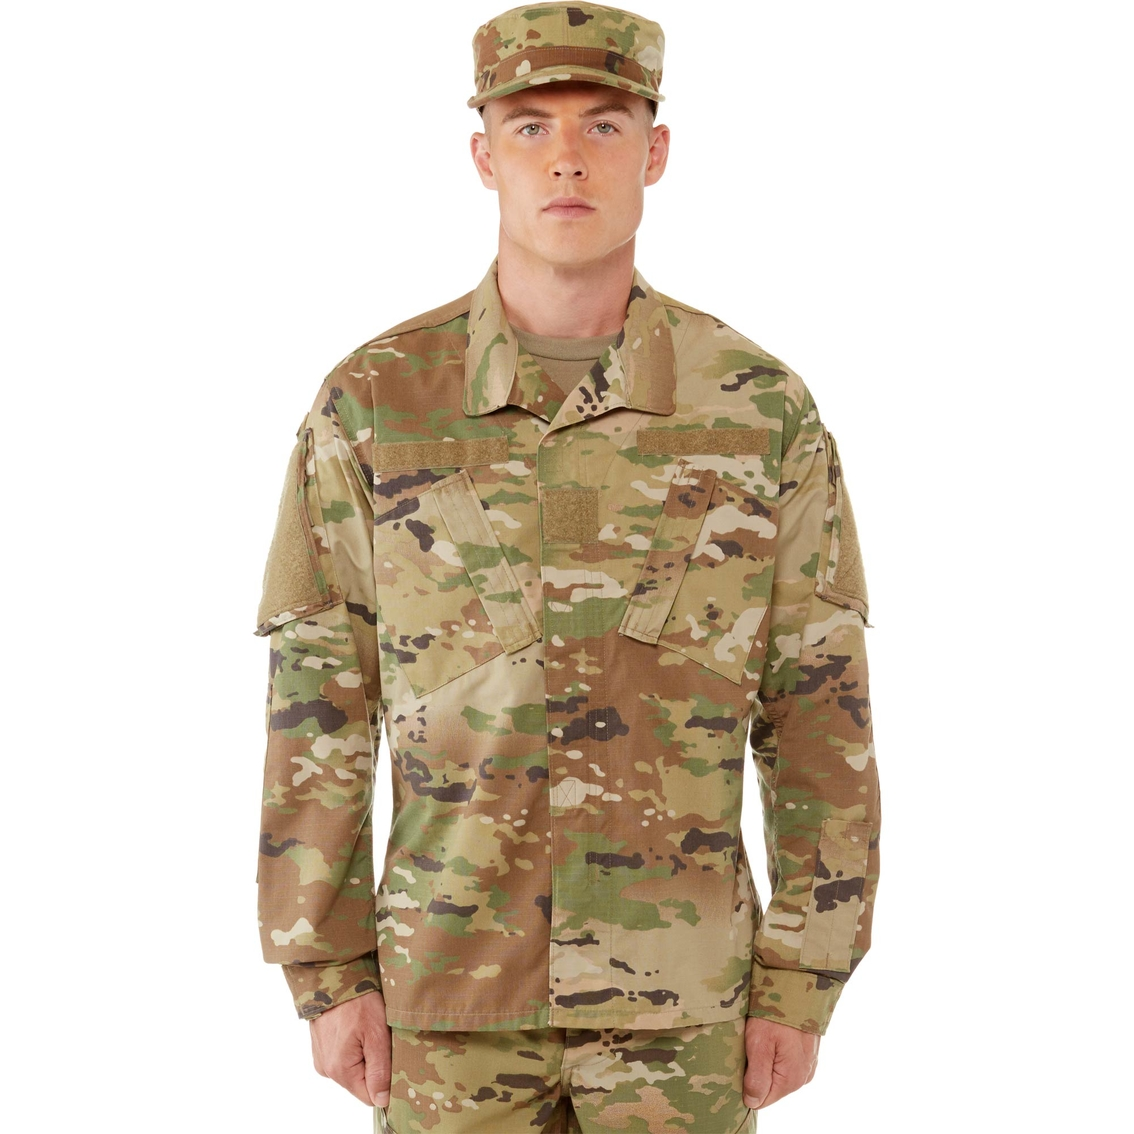 Dlats Army Ocp Acu Coat | Ocp-acu | Military | Shop The Exchange